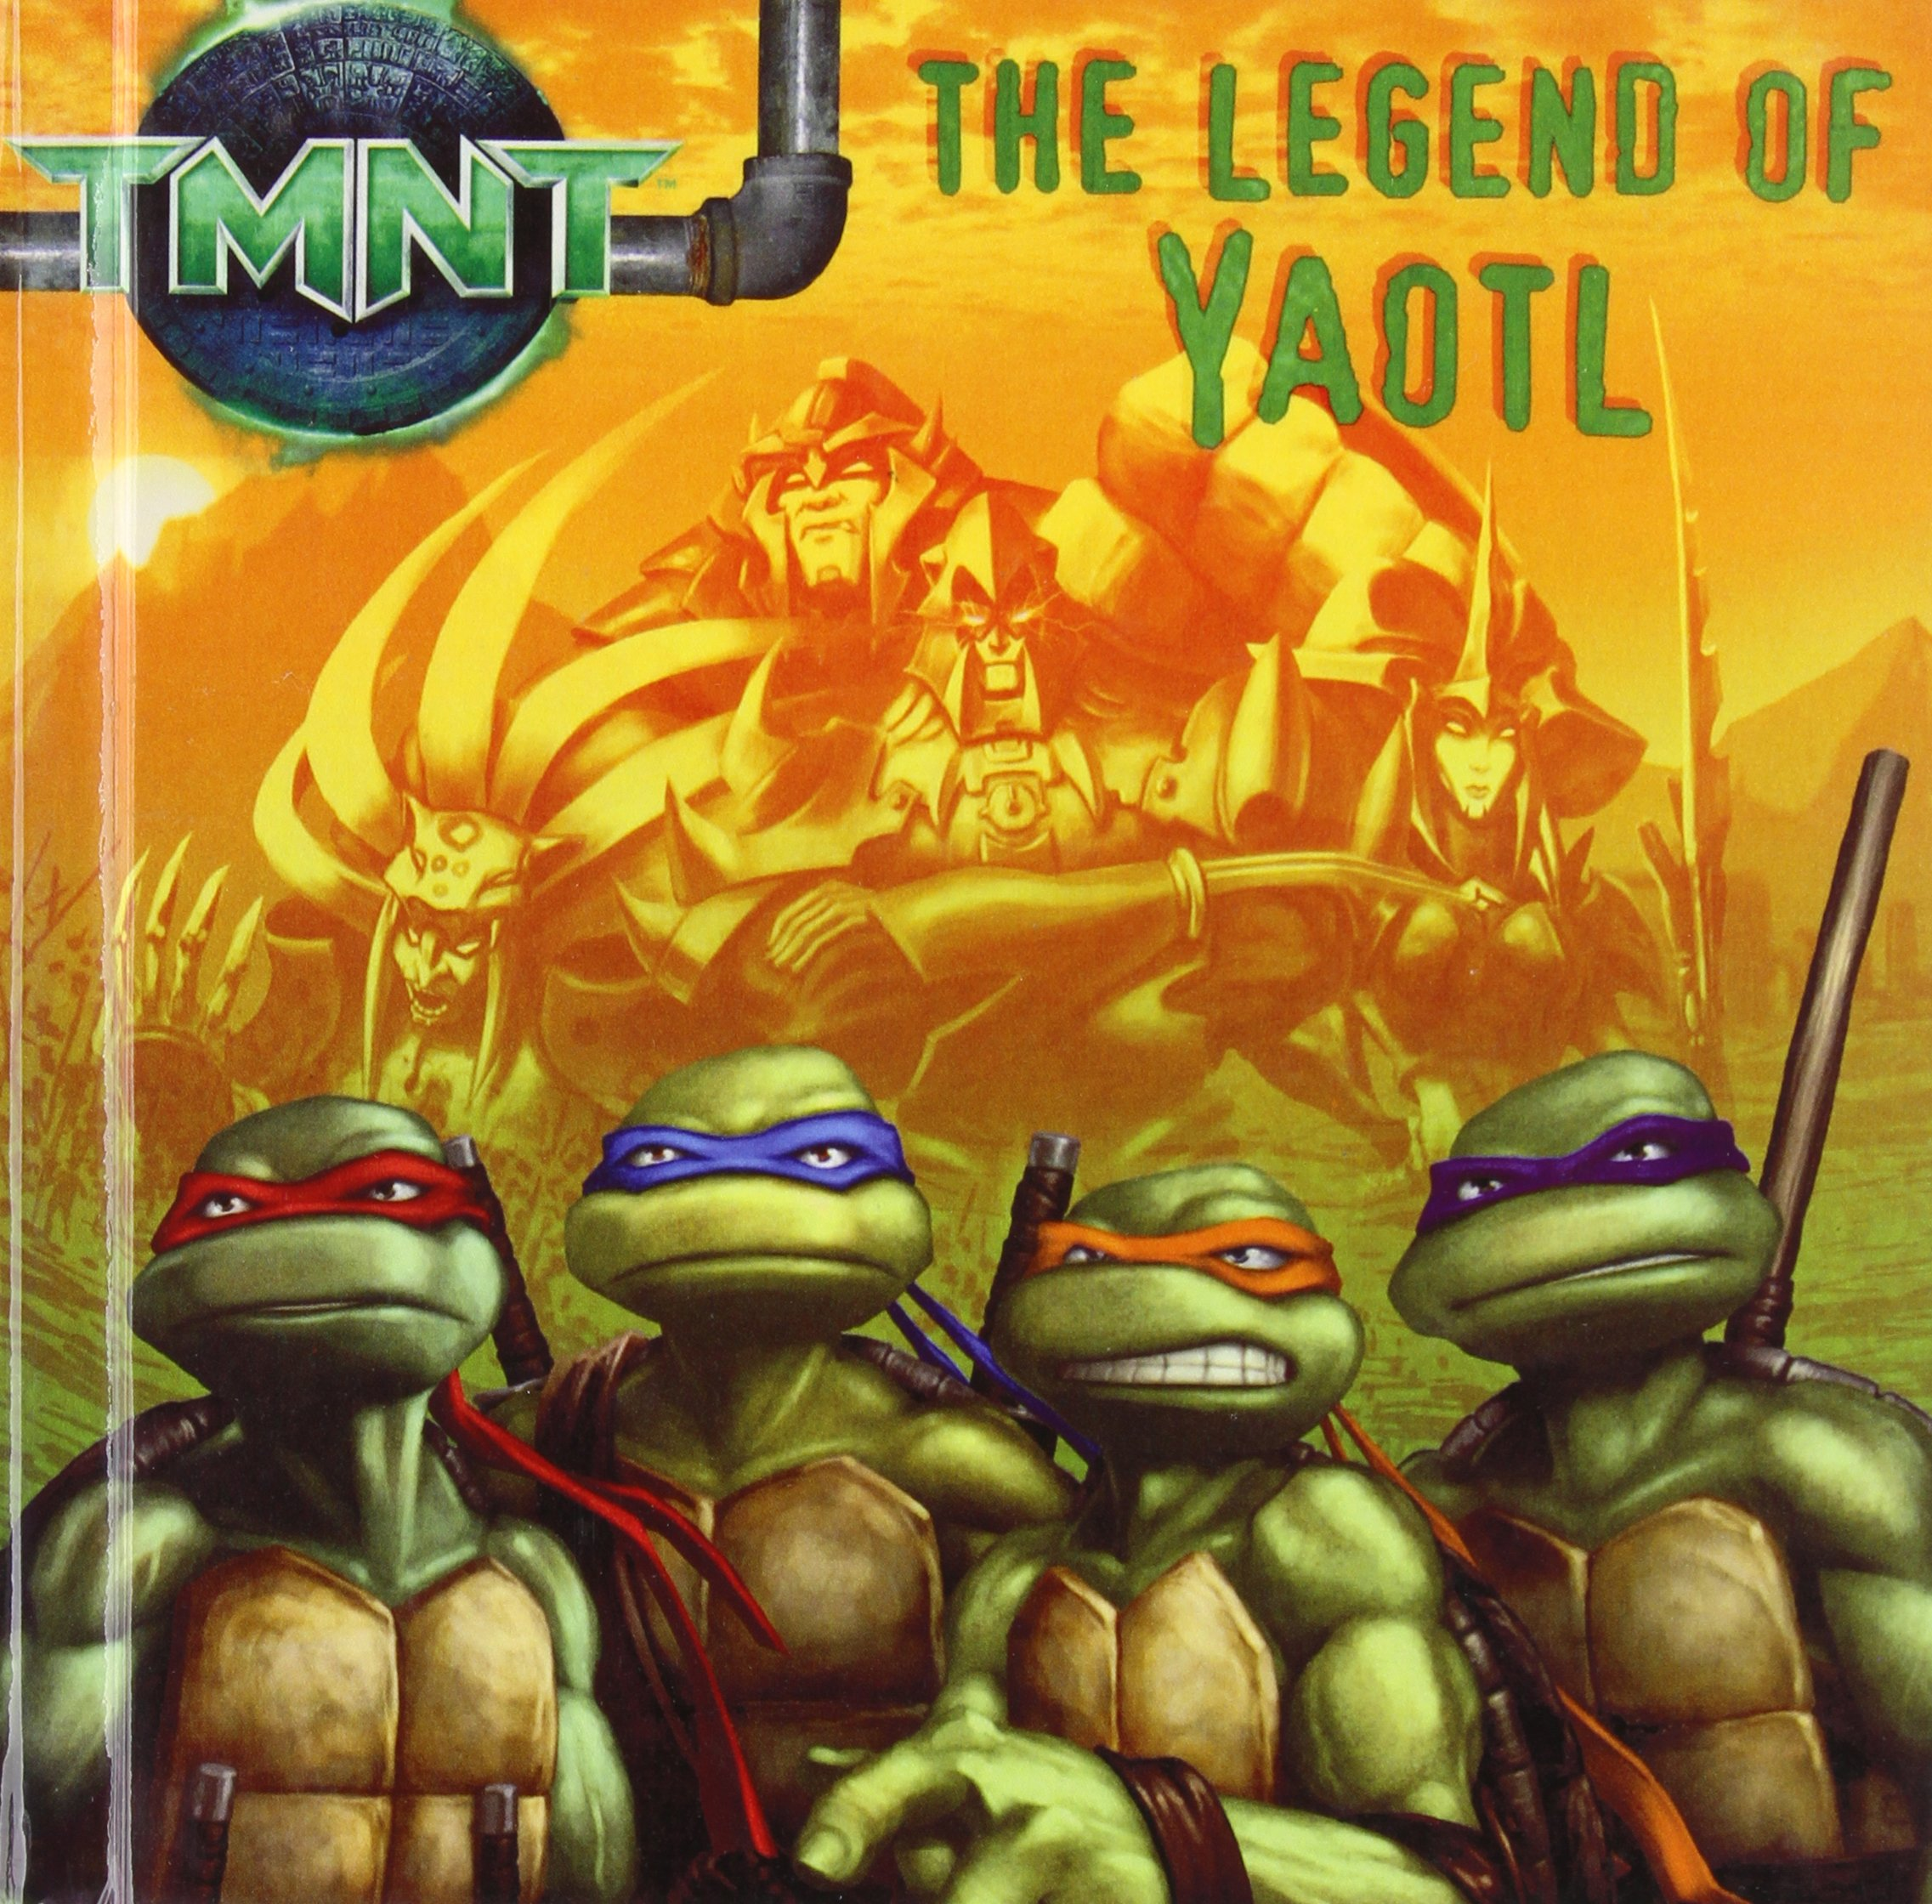 The Legend of Yaotl: Amazon.es: Steve Murphy, Patrick ...